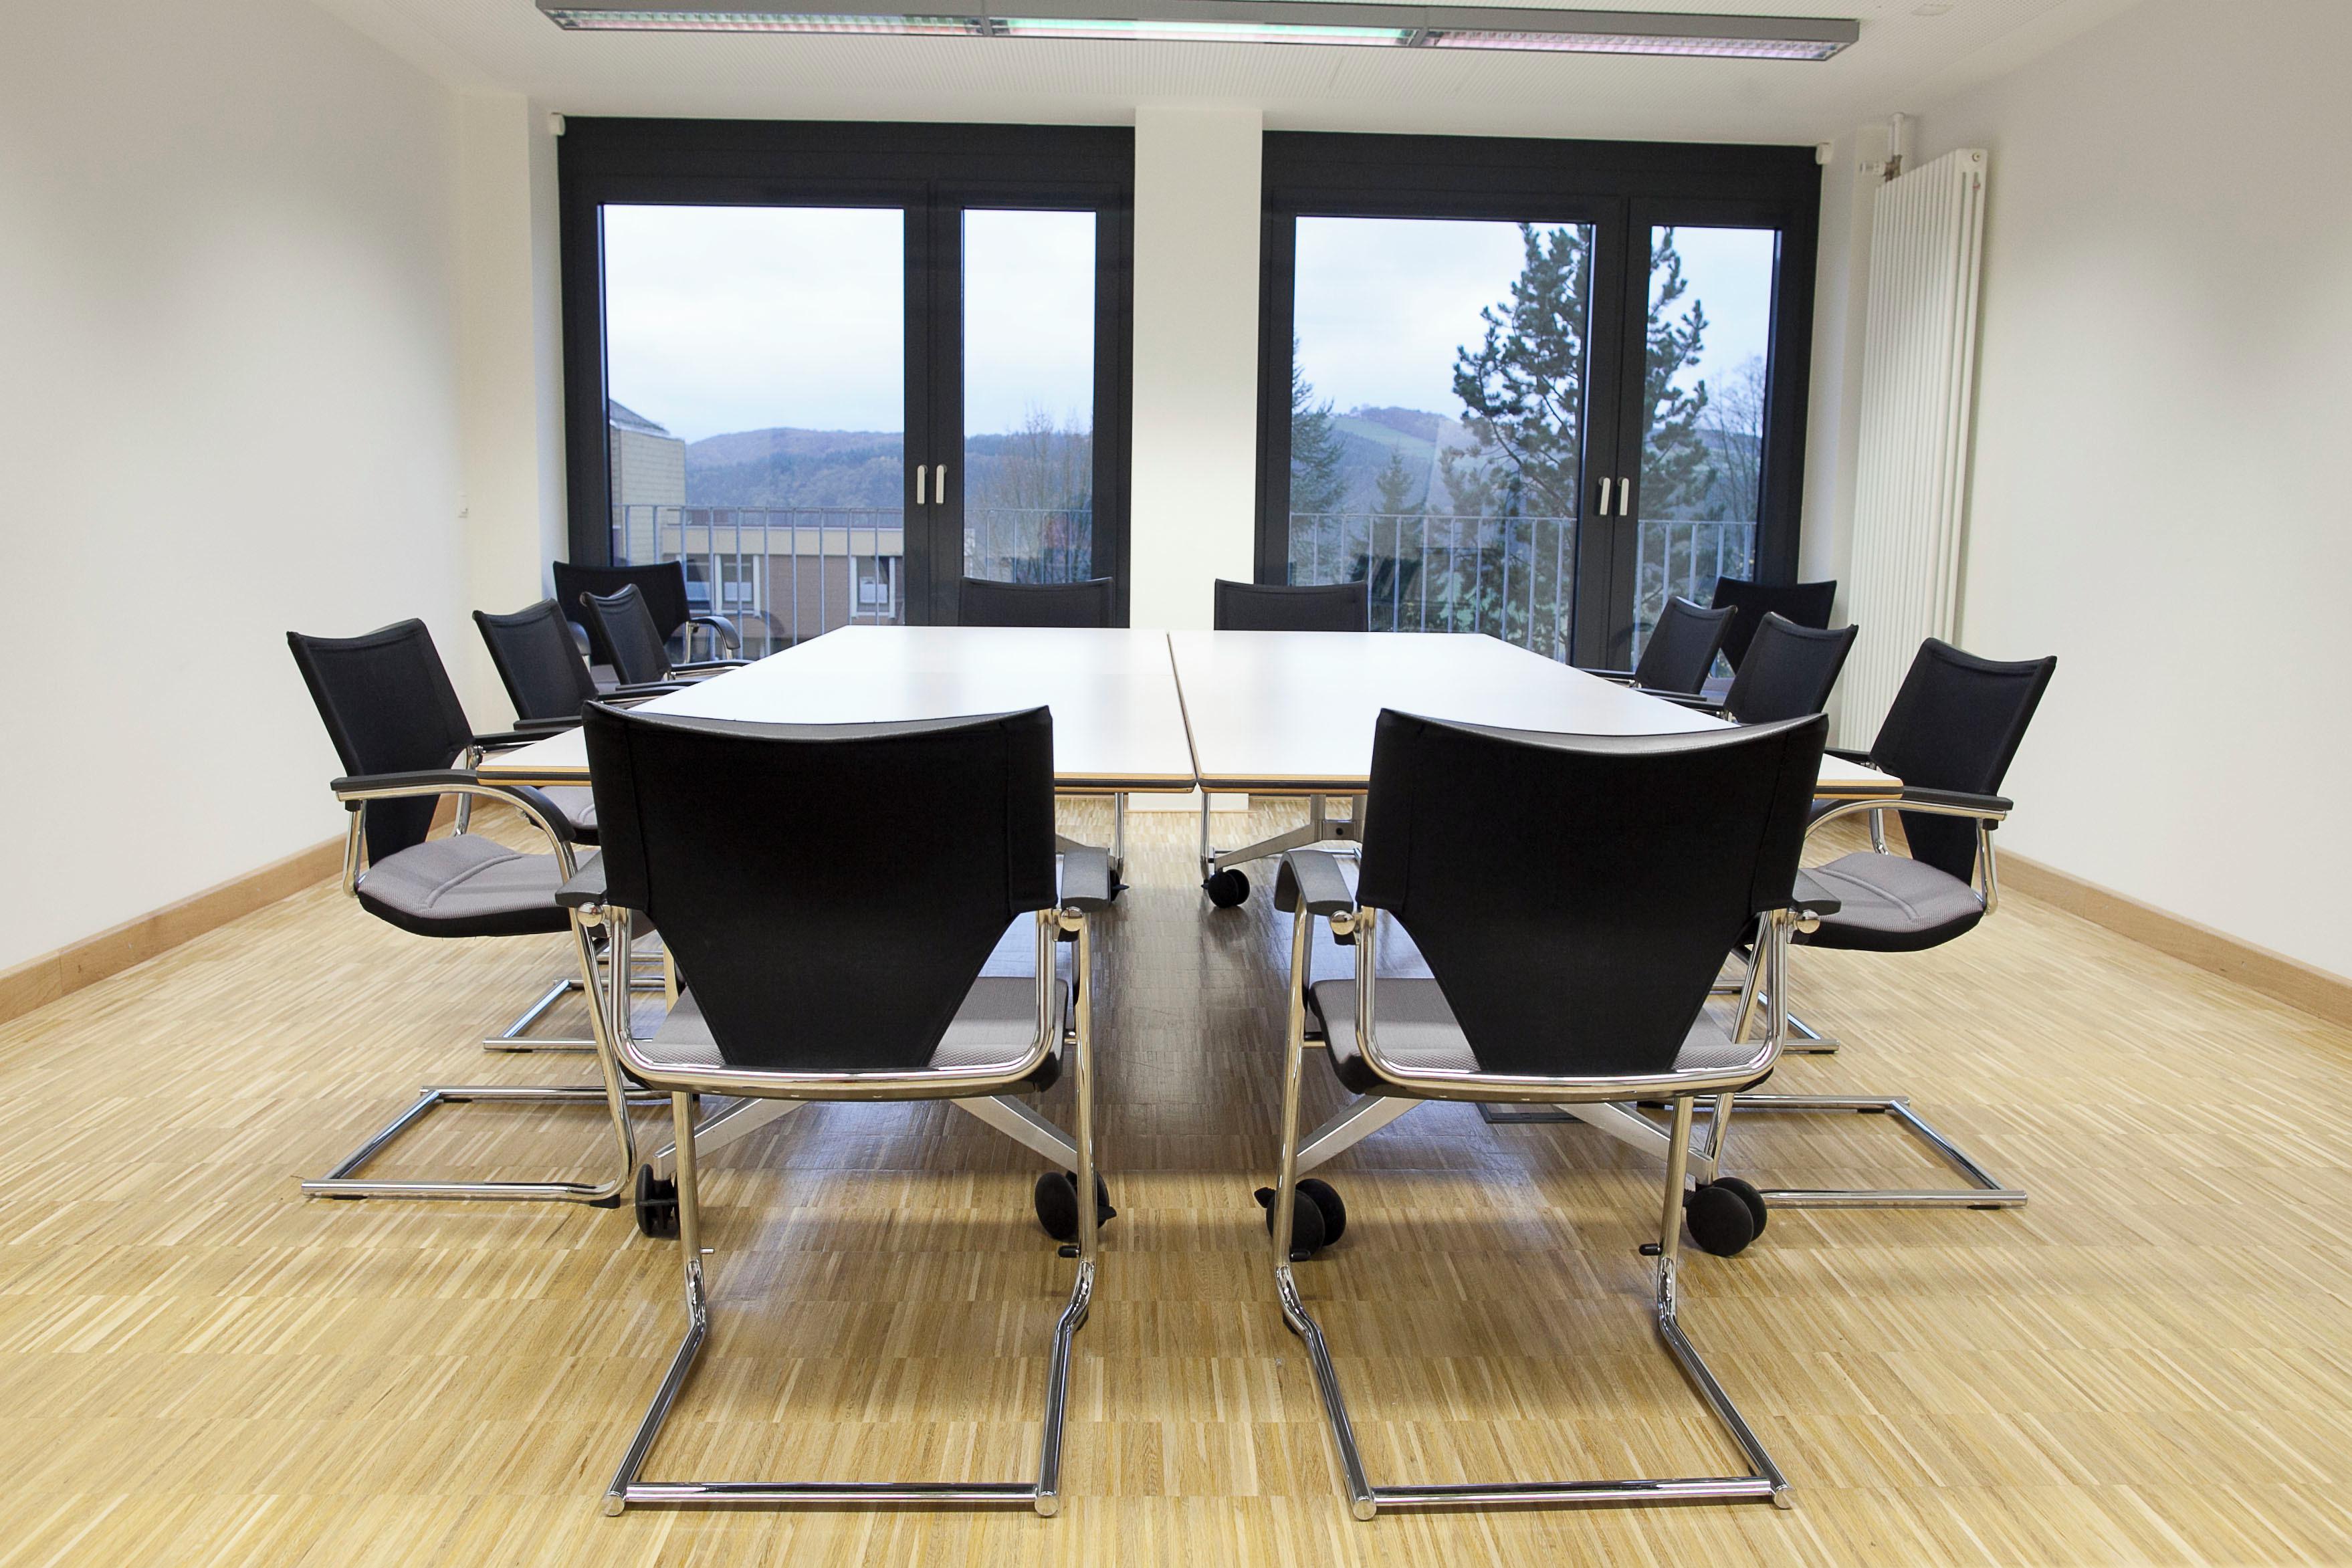 Koblenz Schulungsräume  Klara 2 image 0